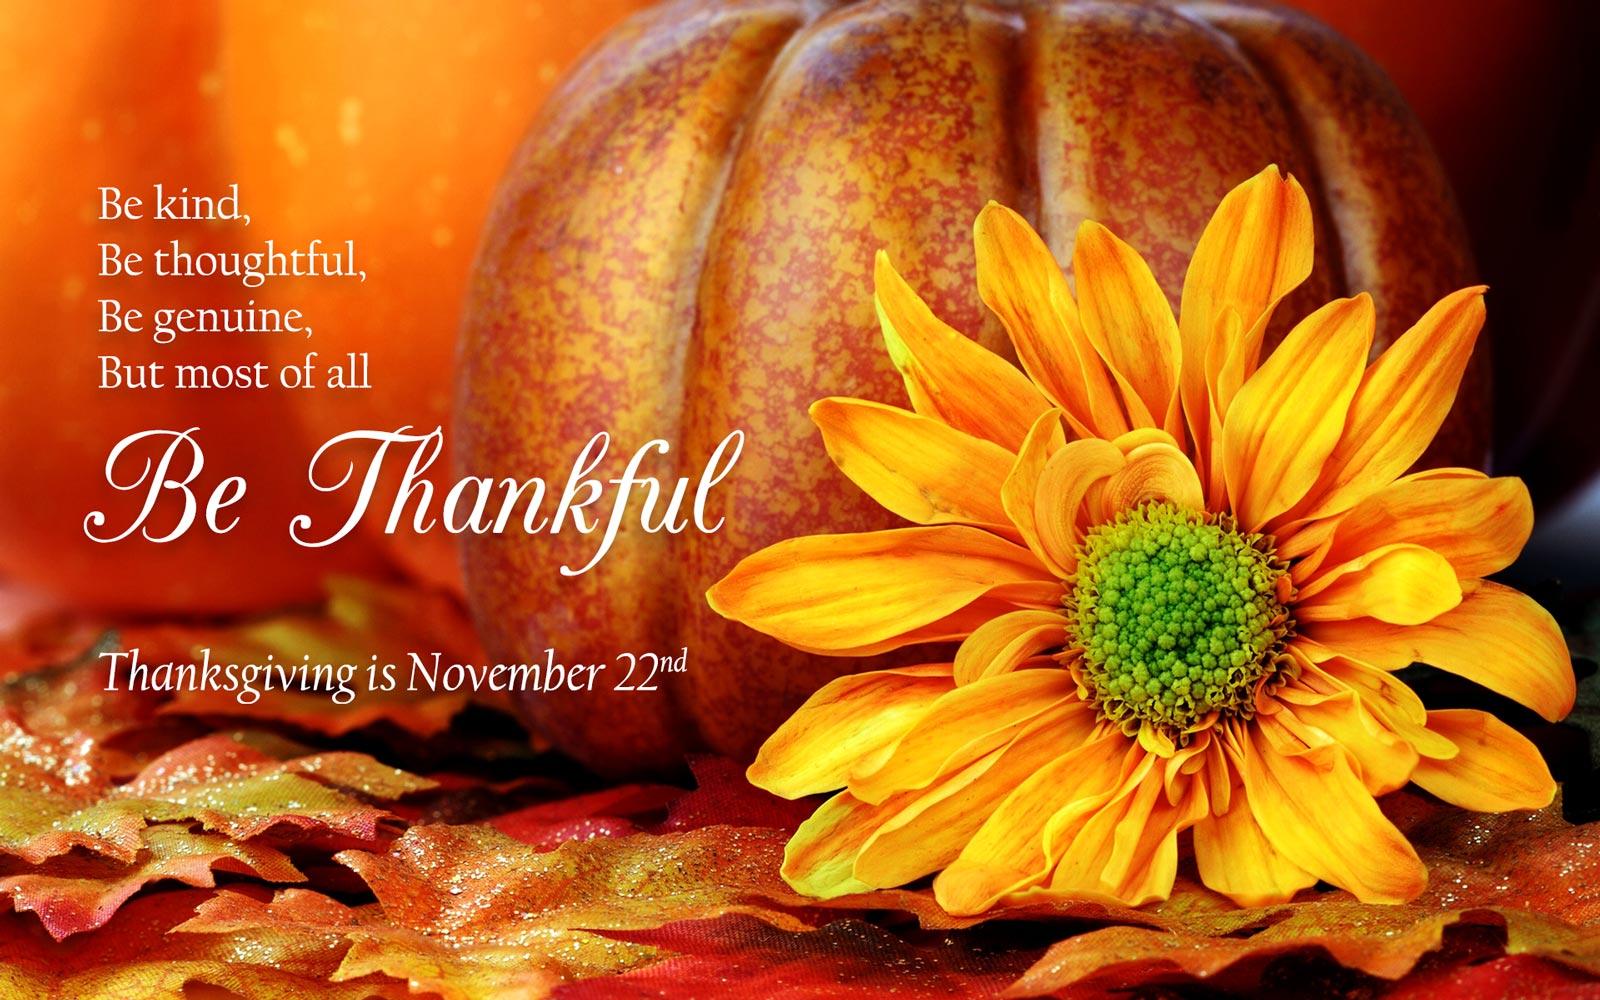 Thanksgiving Flowers from In Full Bloom Florist in Farmingdale, New York, 516-420-4313